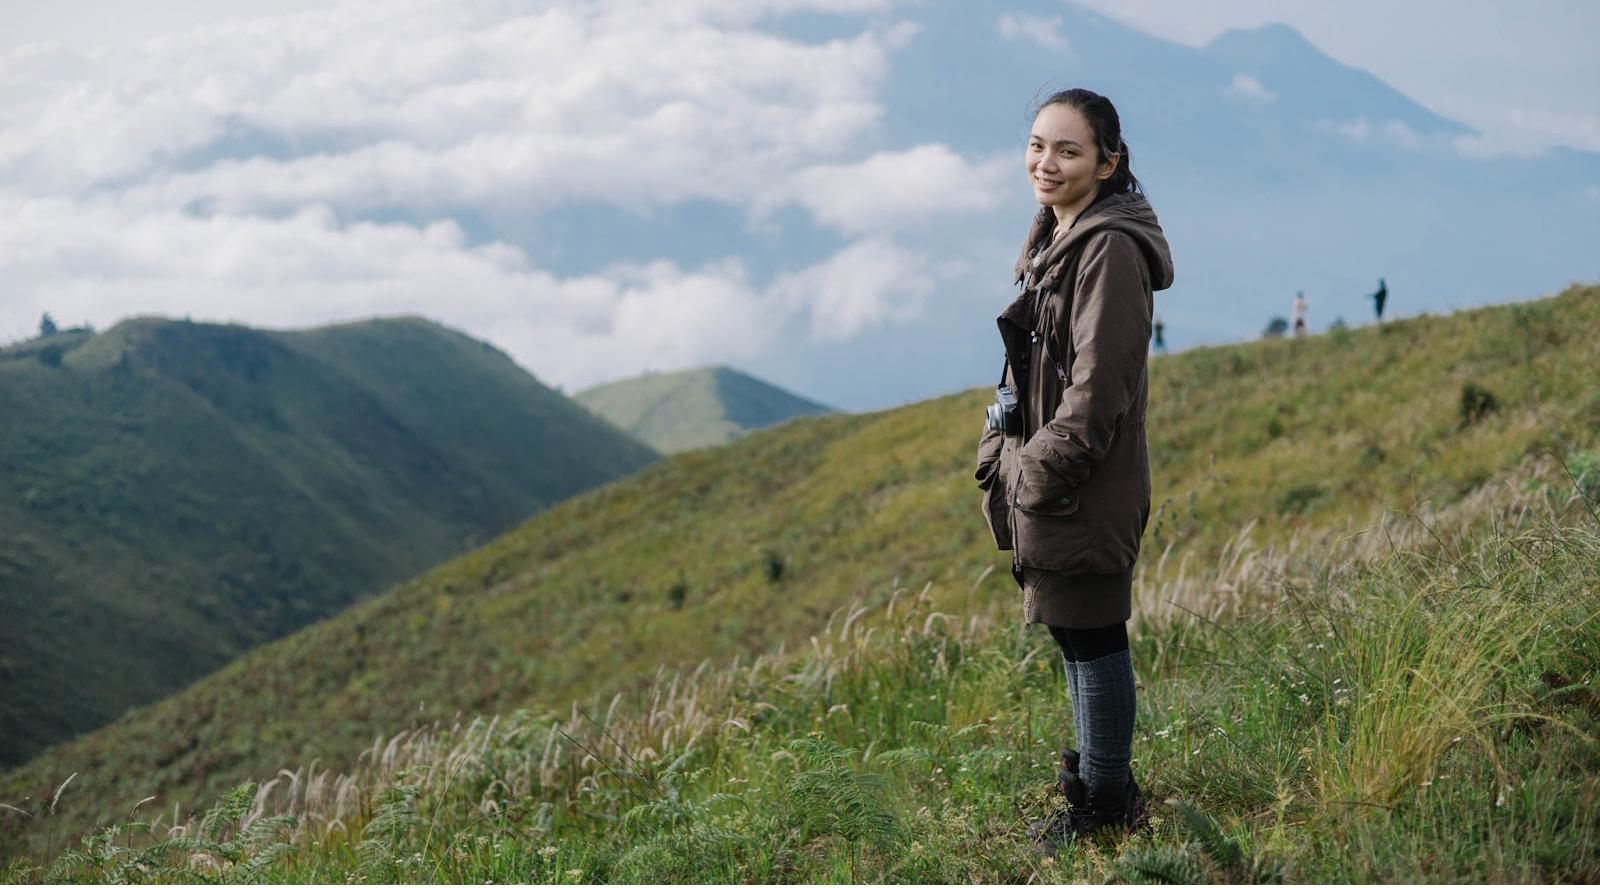 siapa pemliki akun pnedaki wanita cantik Gunung Prau (2.565 mdpl) - Wonosobo